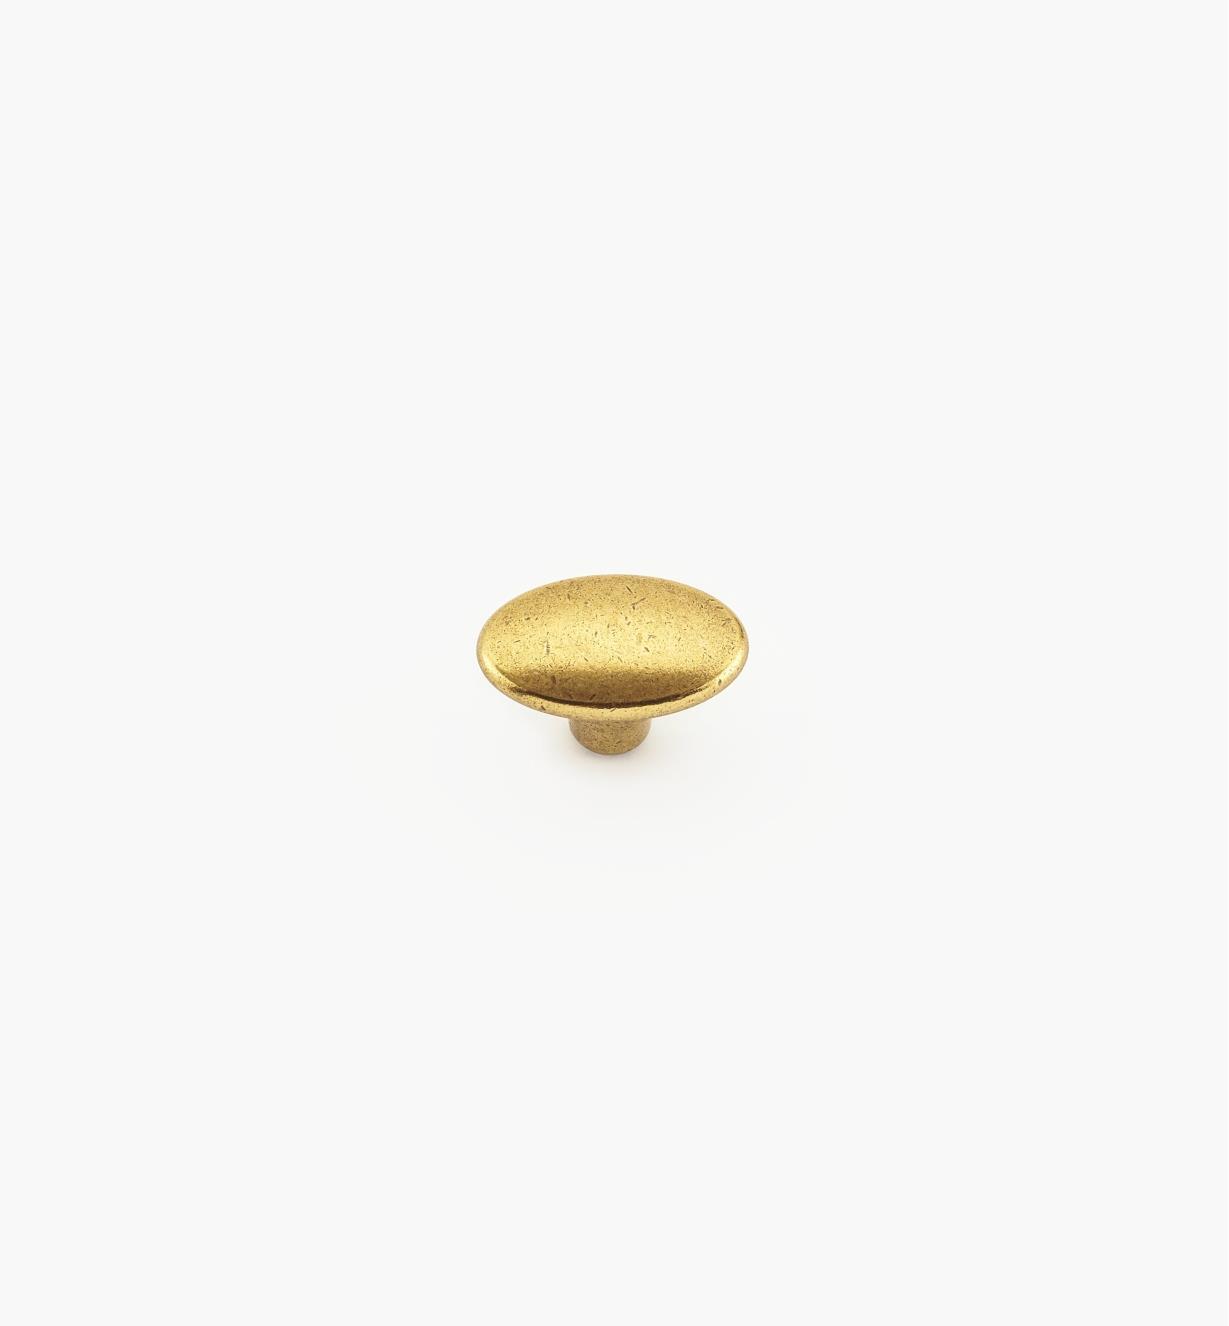 00A7160 - Bouton ovale de 30mmx 19mm, fini bronze bruni